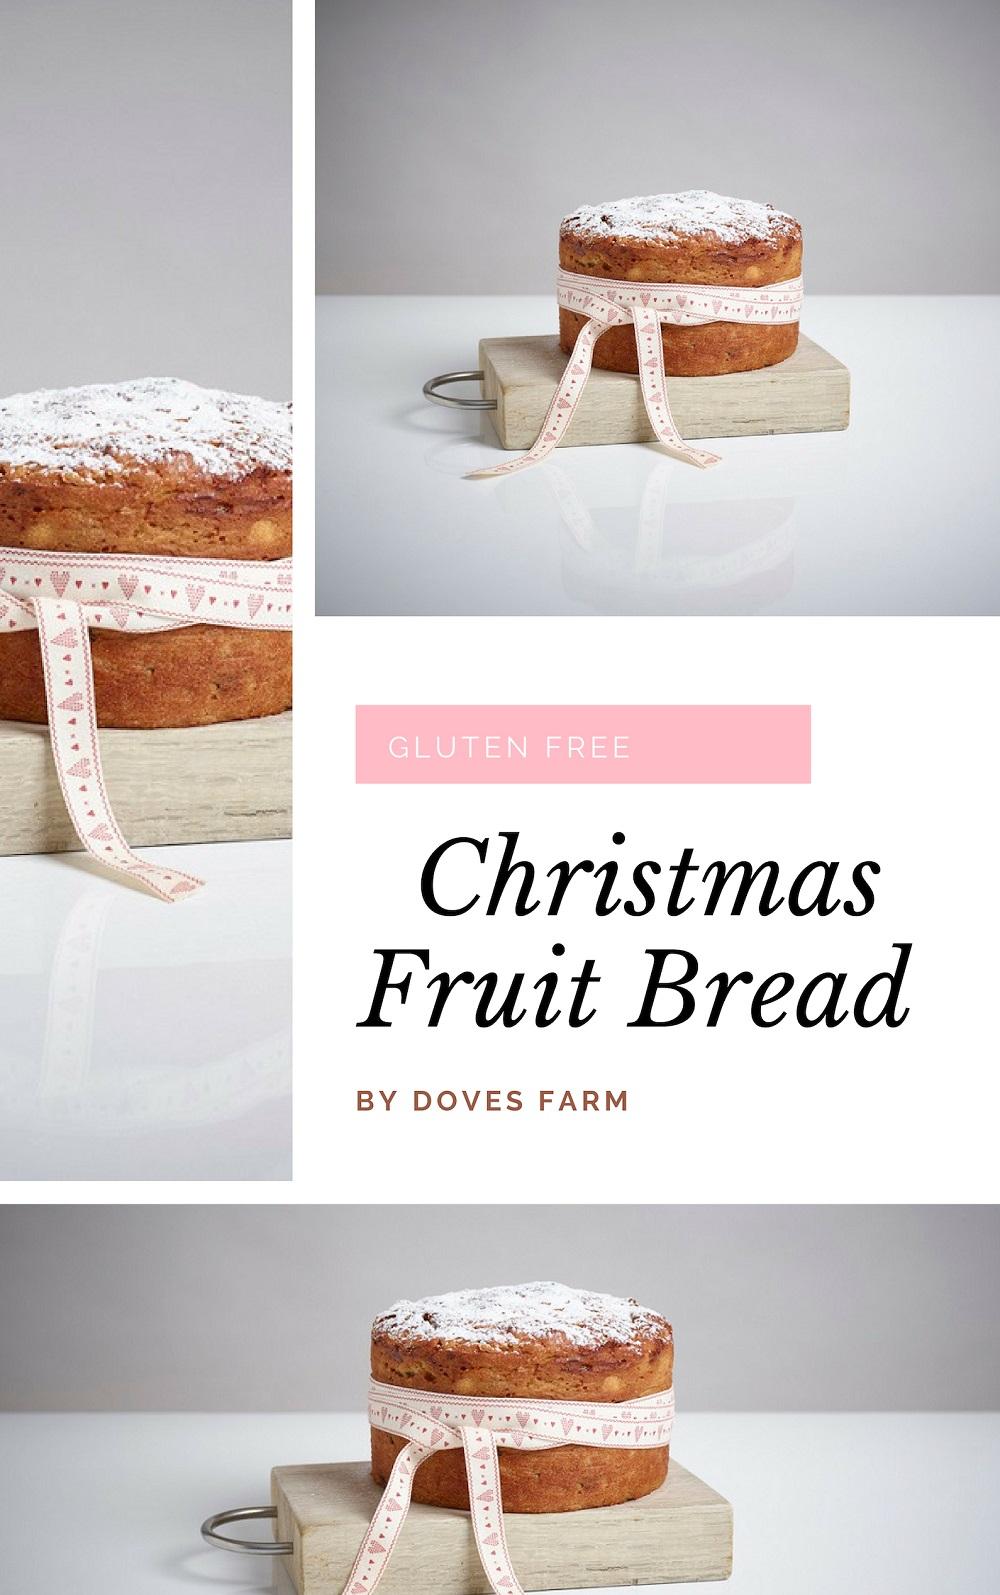 Gluten Free Christmas Fruit Bread